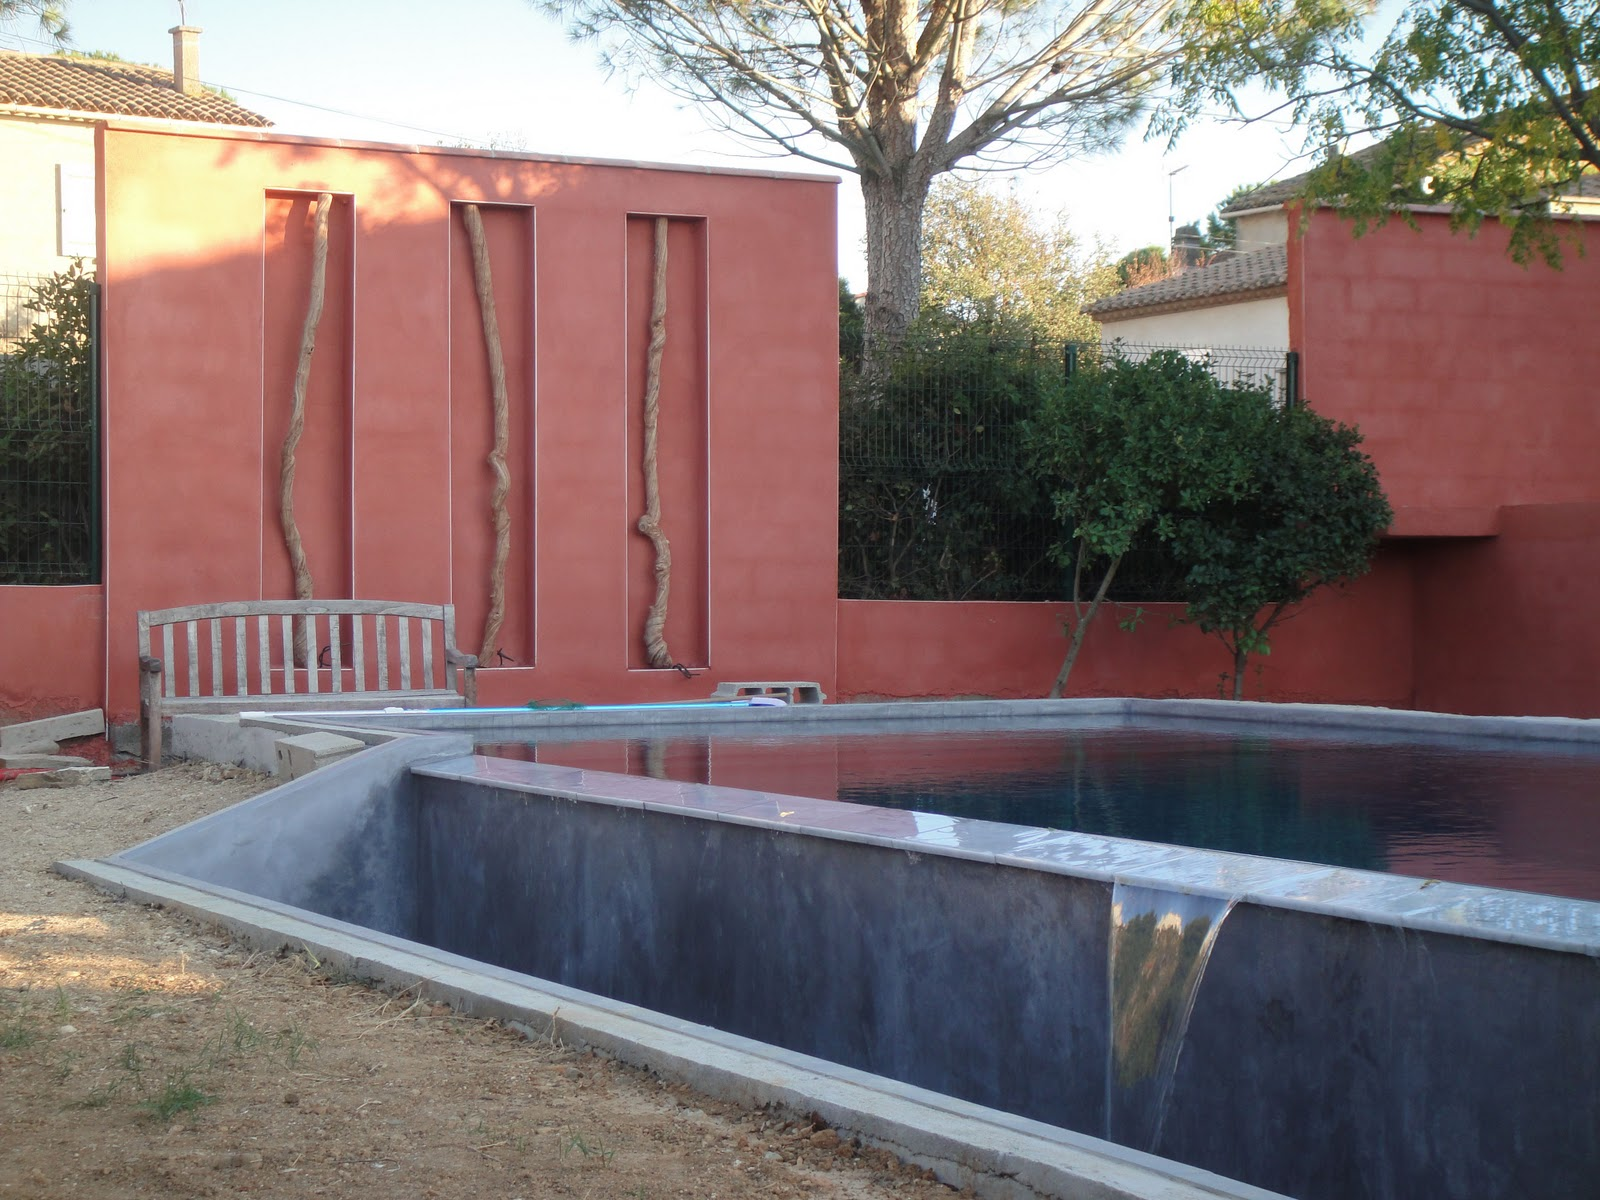 Terrasses ip et hydrocapt construction piscine diffazur for Construction piscine diffazur